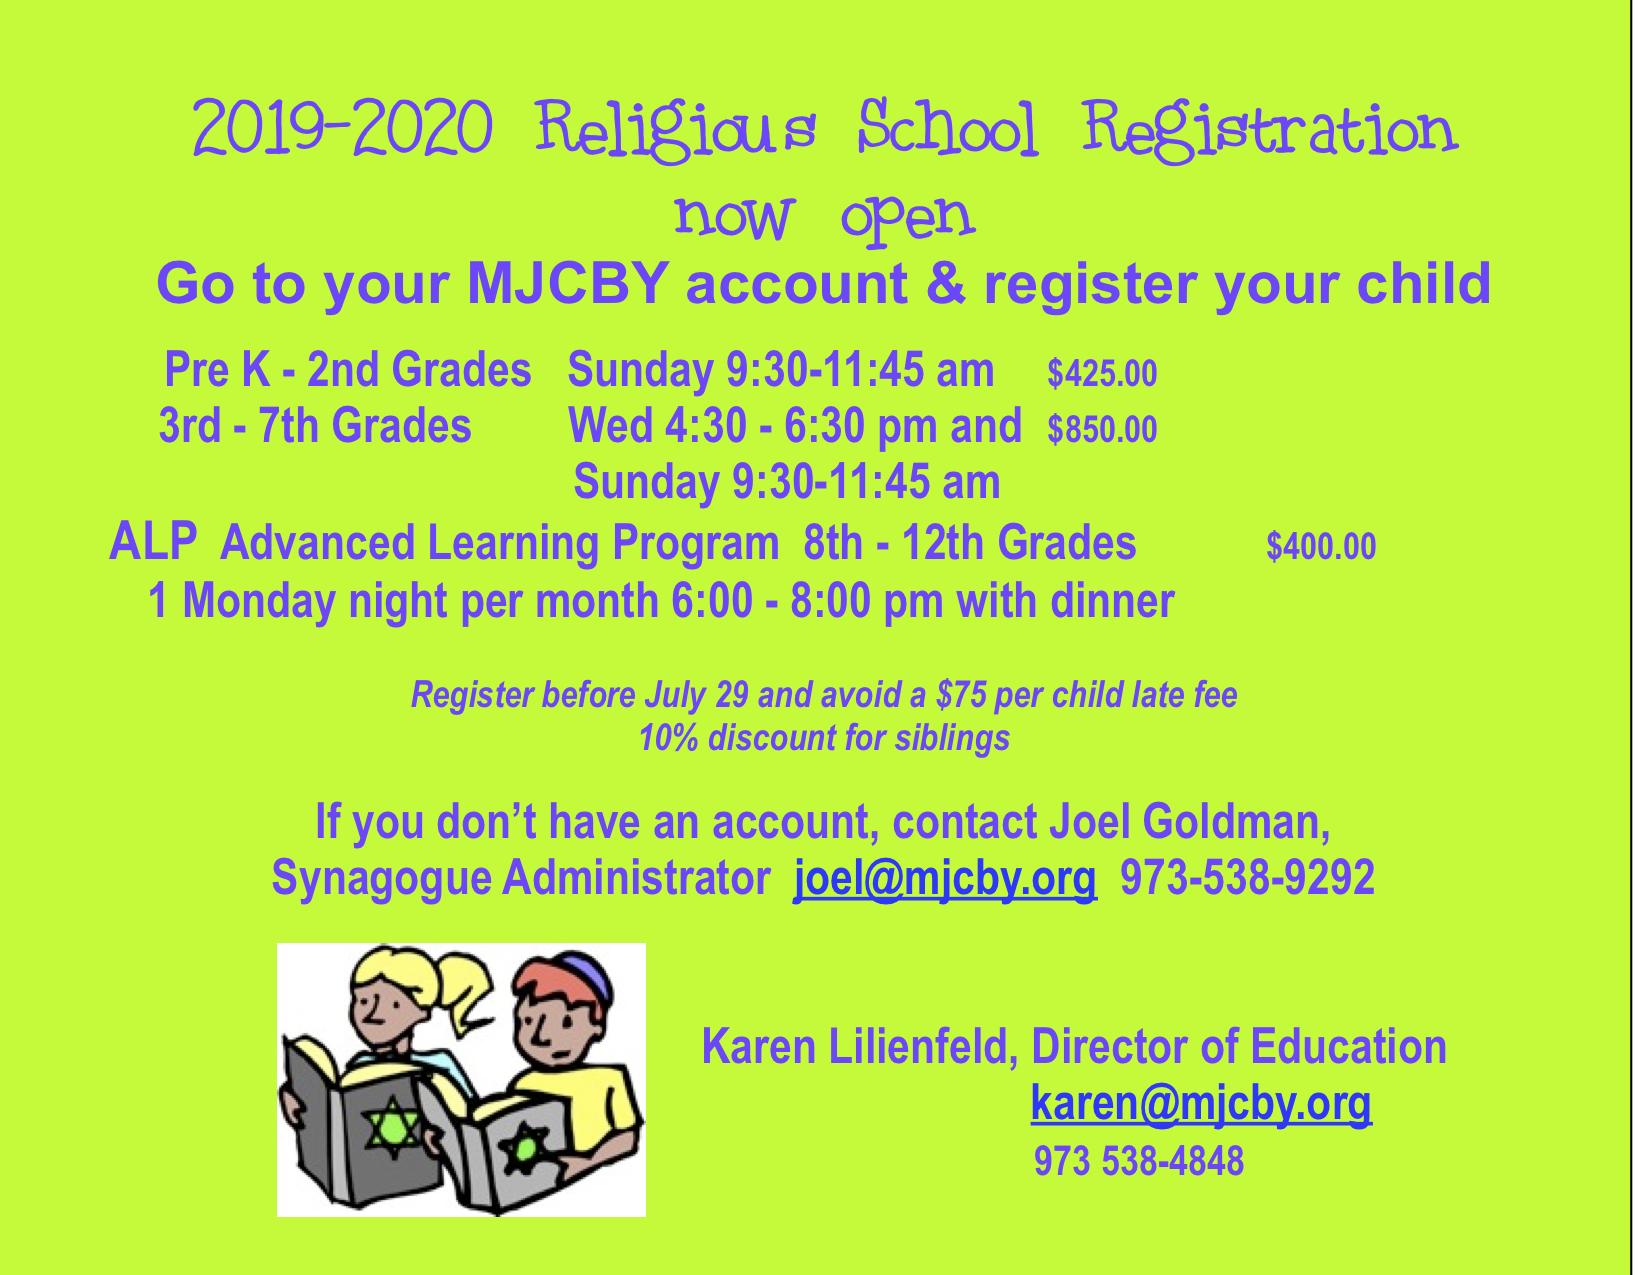 2019 2020 Morristown Jewish Center Religious School